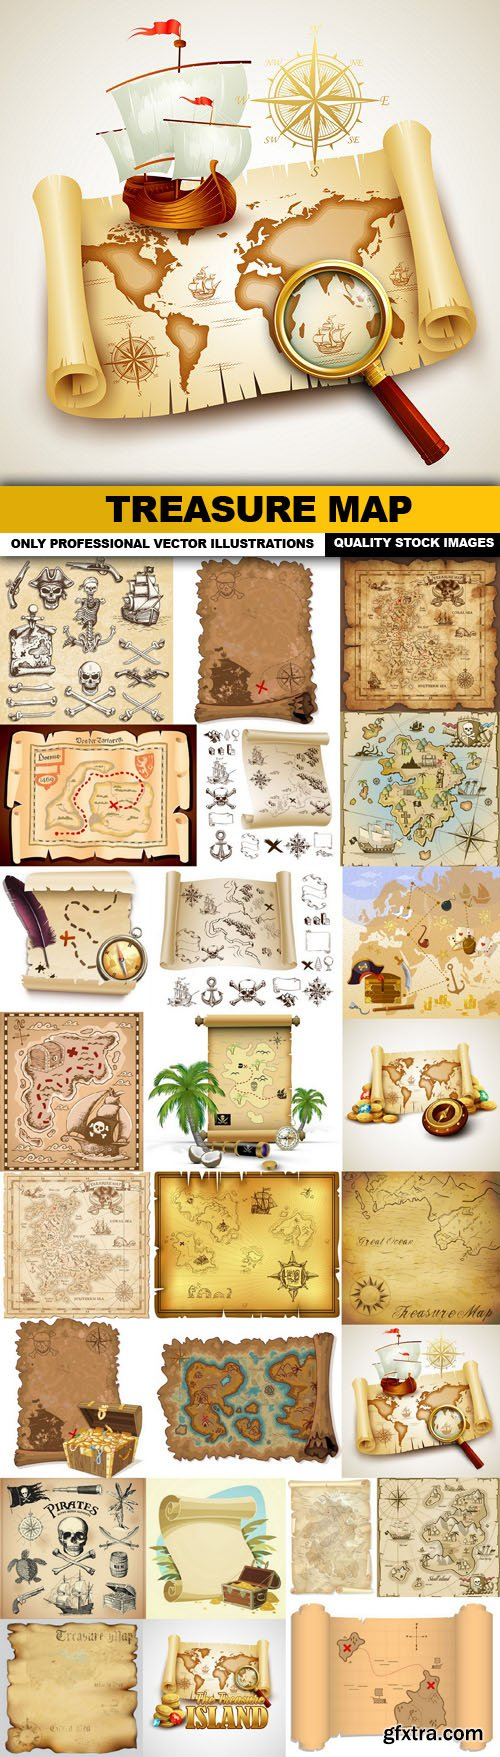 Treasure Map - 25 Vector